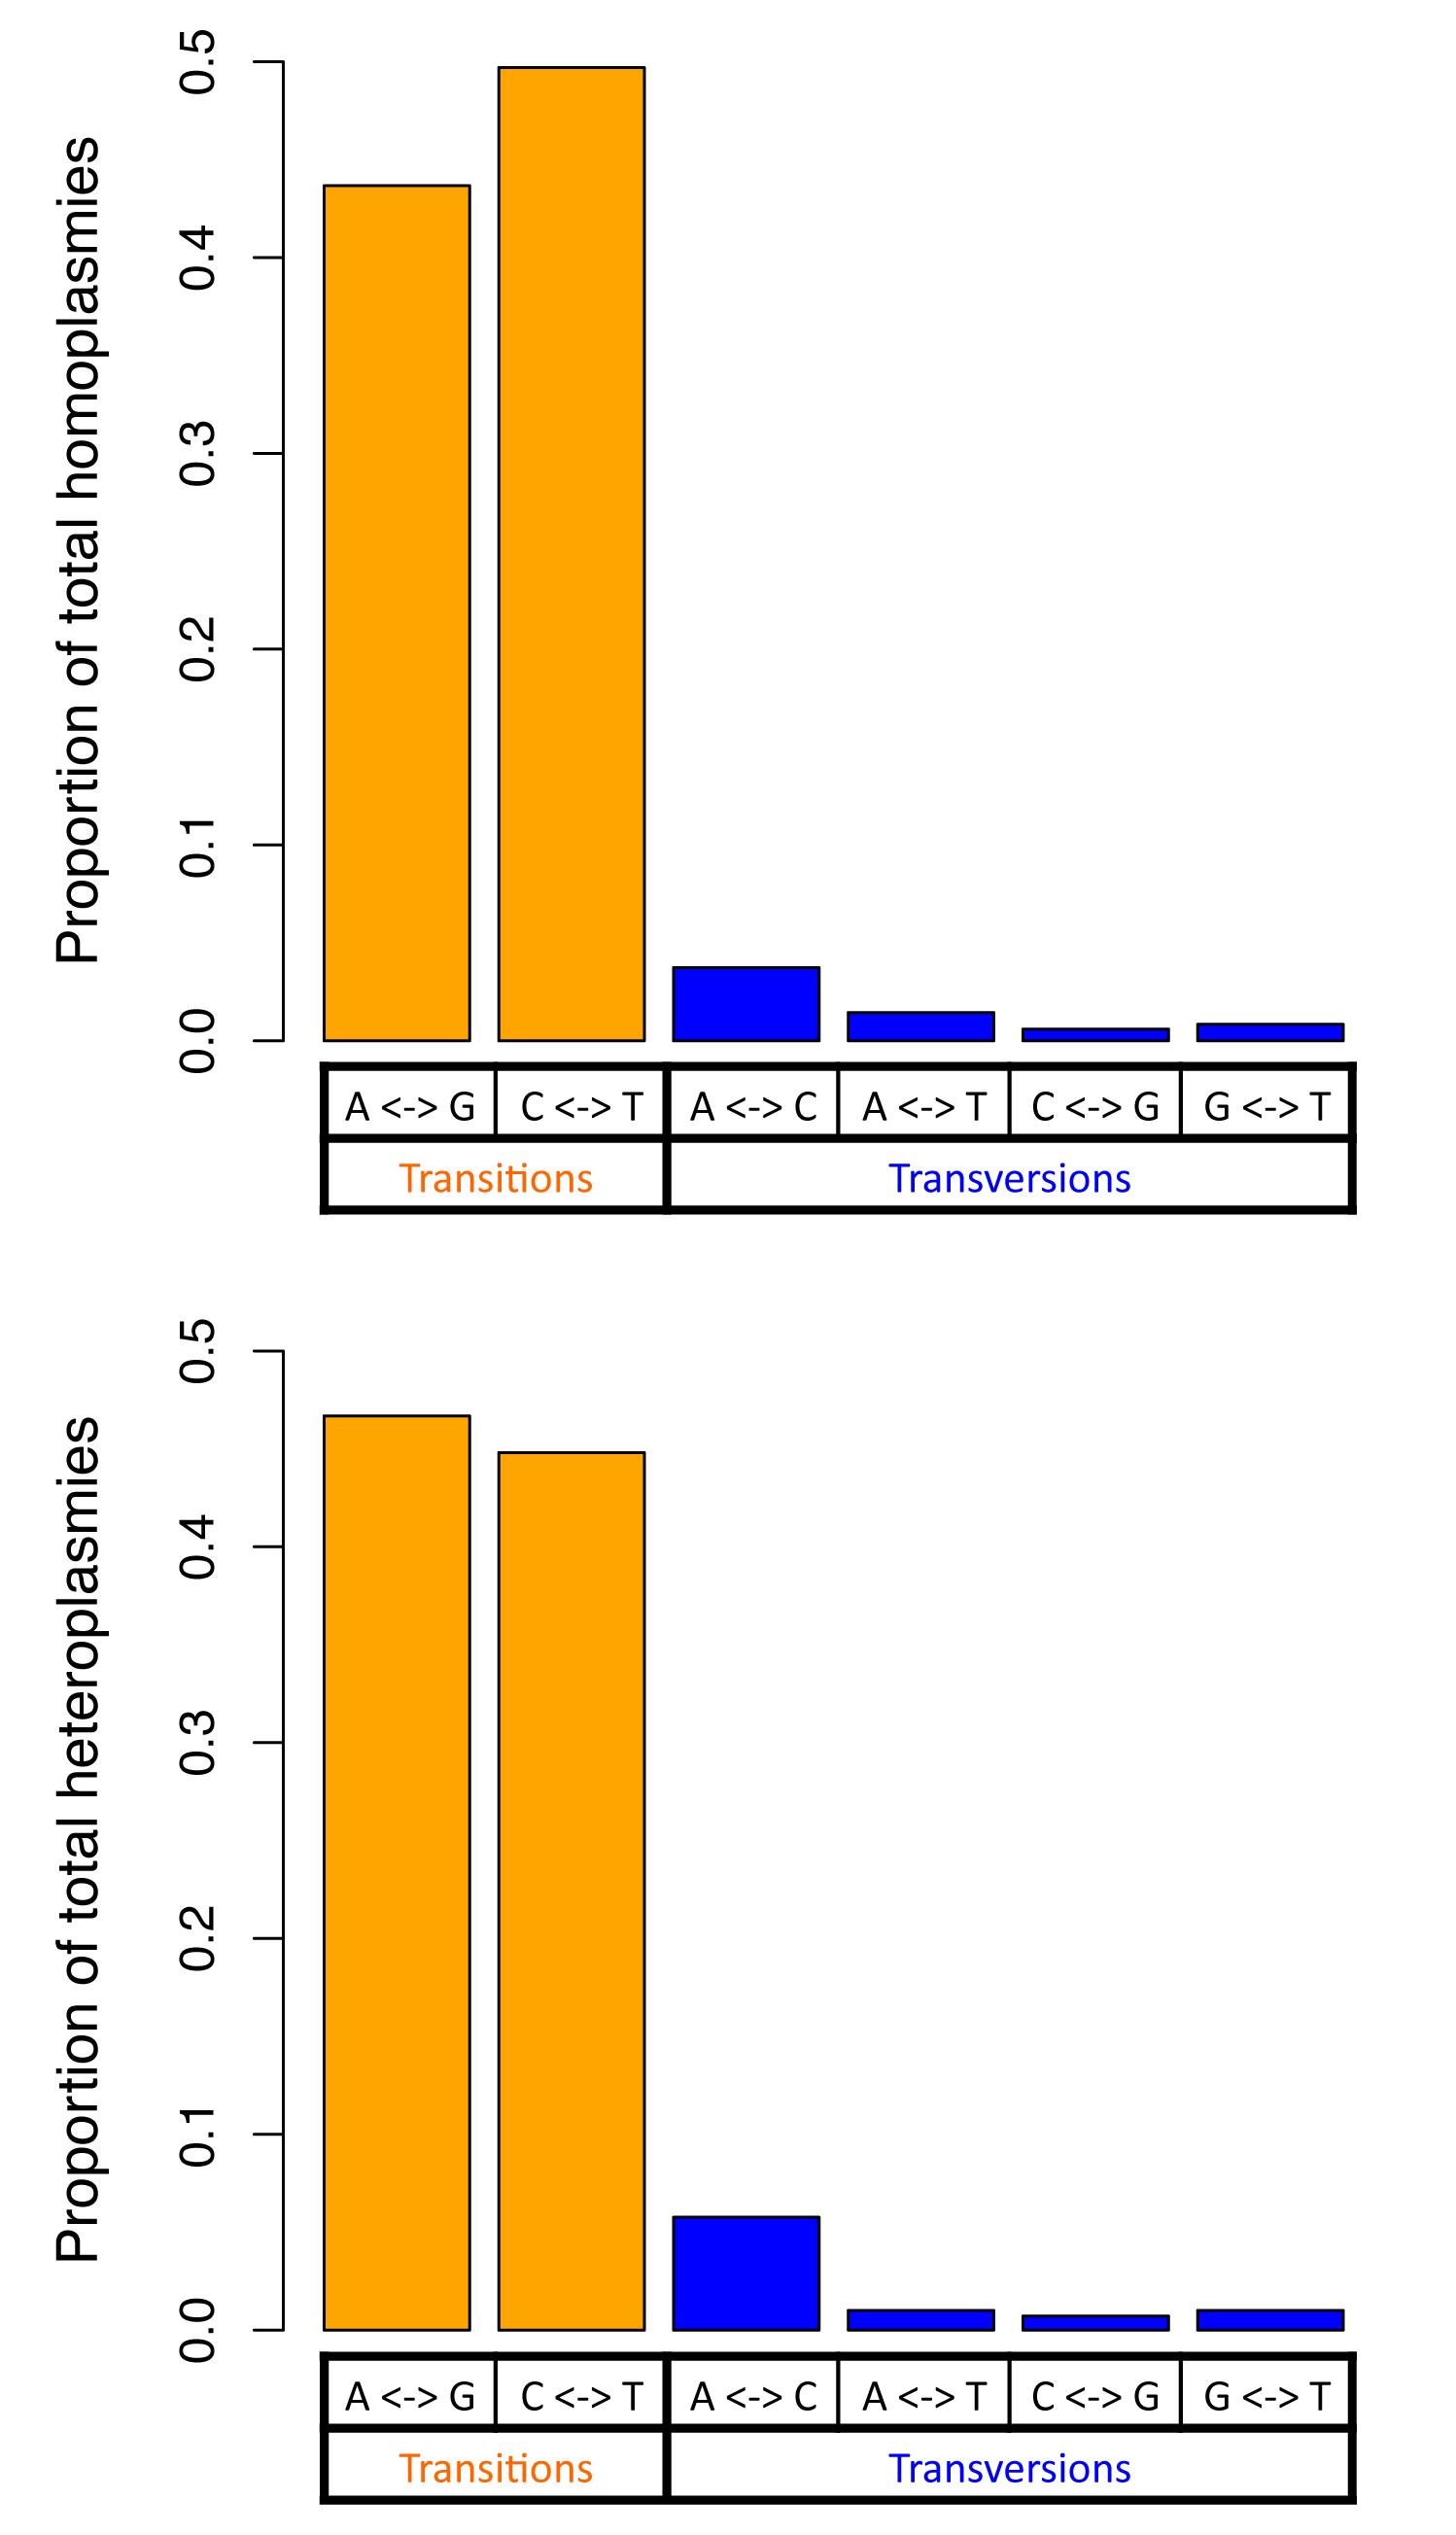 Two classes of base changes for homoplasmies and heteroplasmies.